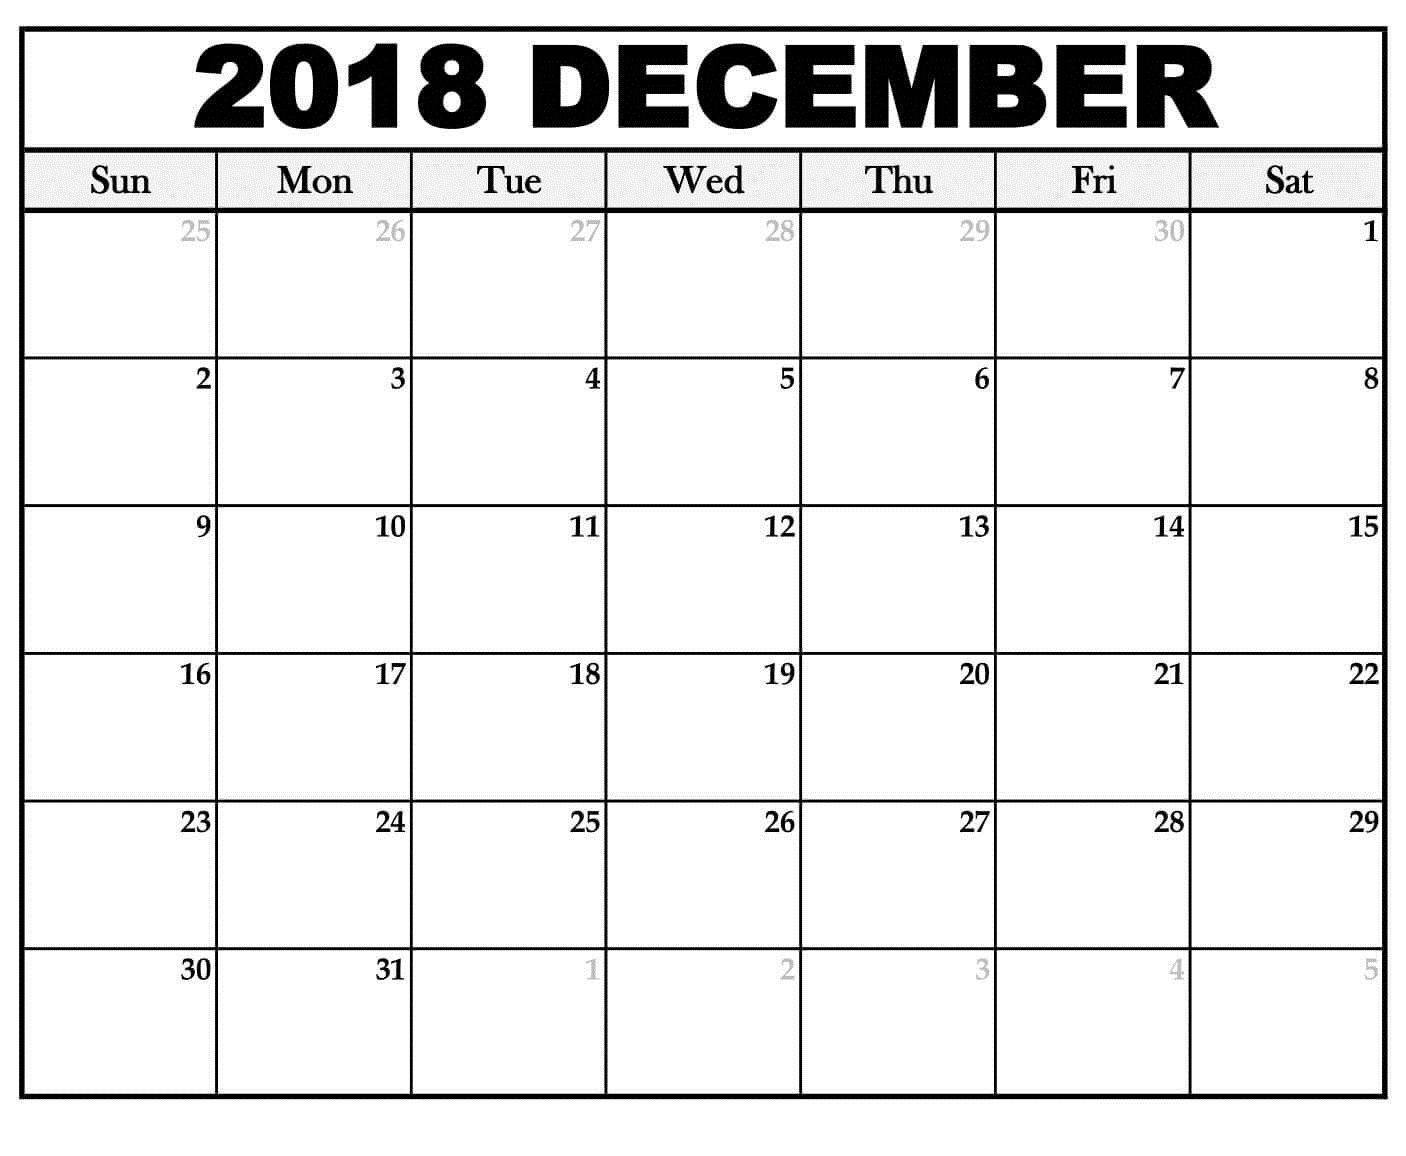 Calendar December 2018 Editable Template   Printable